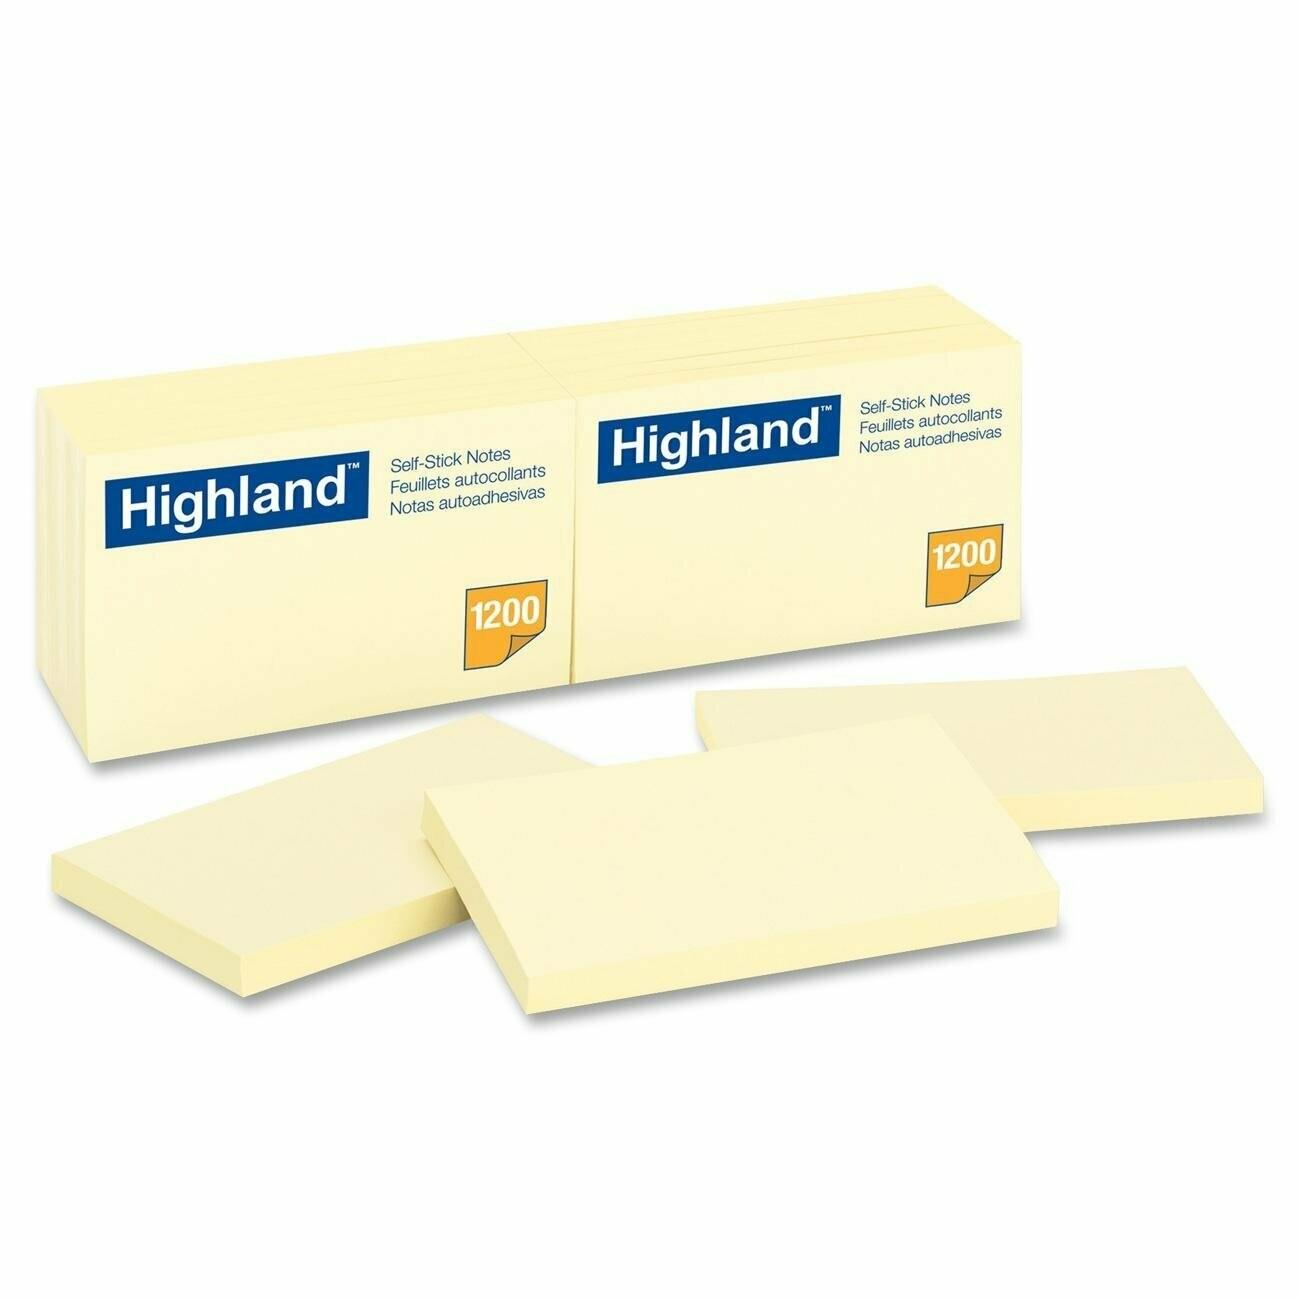 "Highland / Self-Stick Notes, 3 x 5"", Yellow"